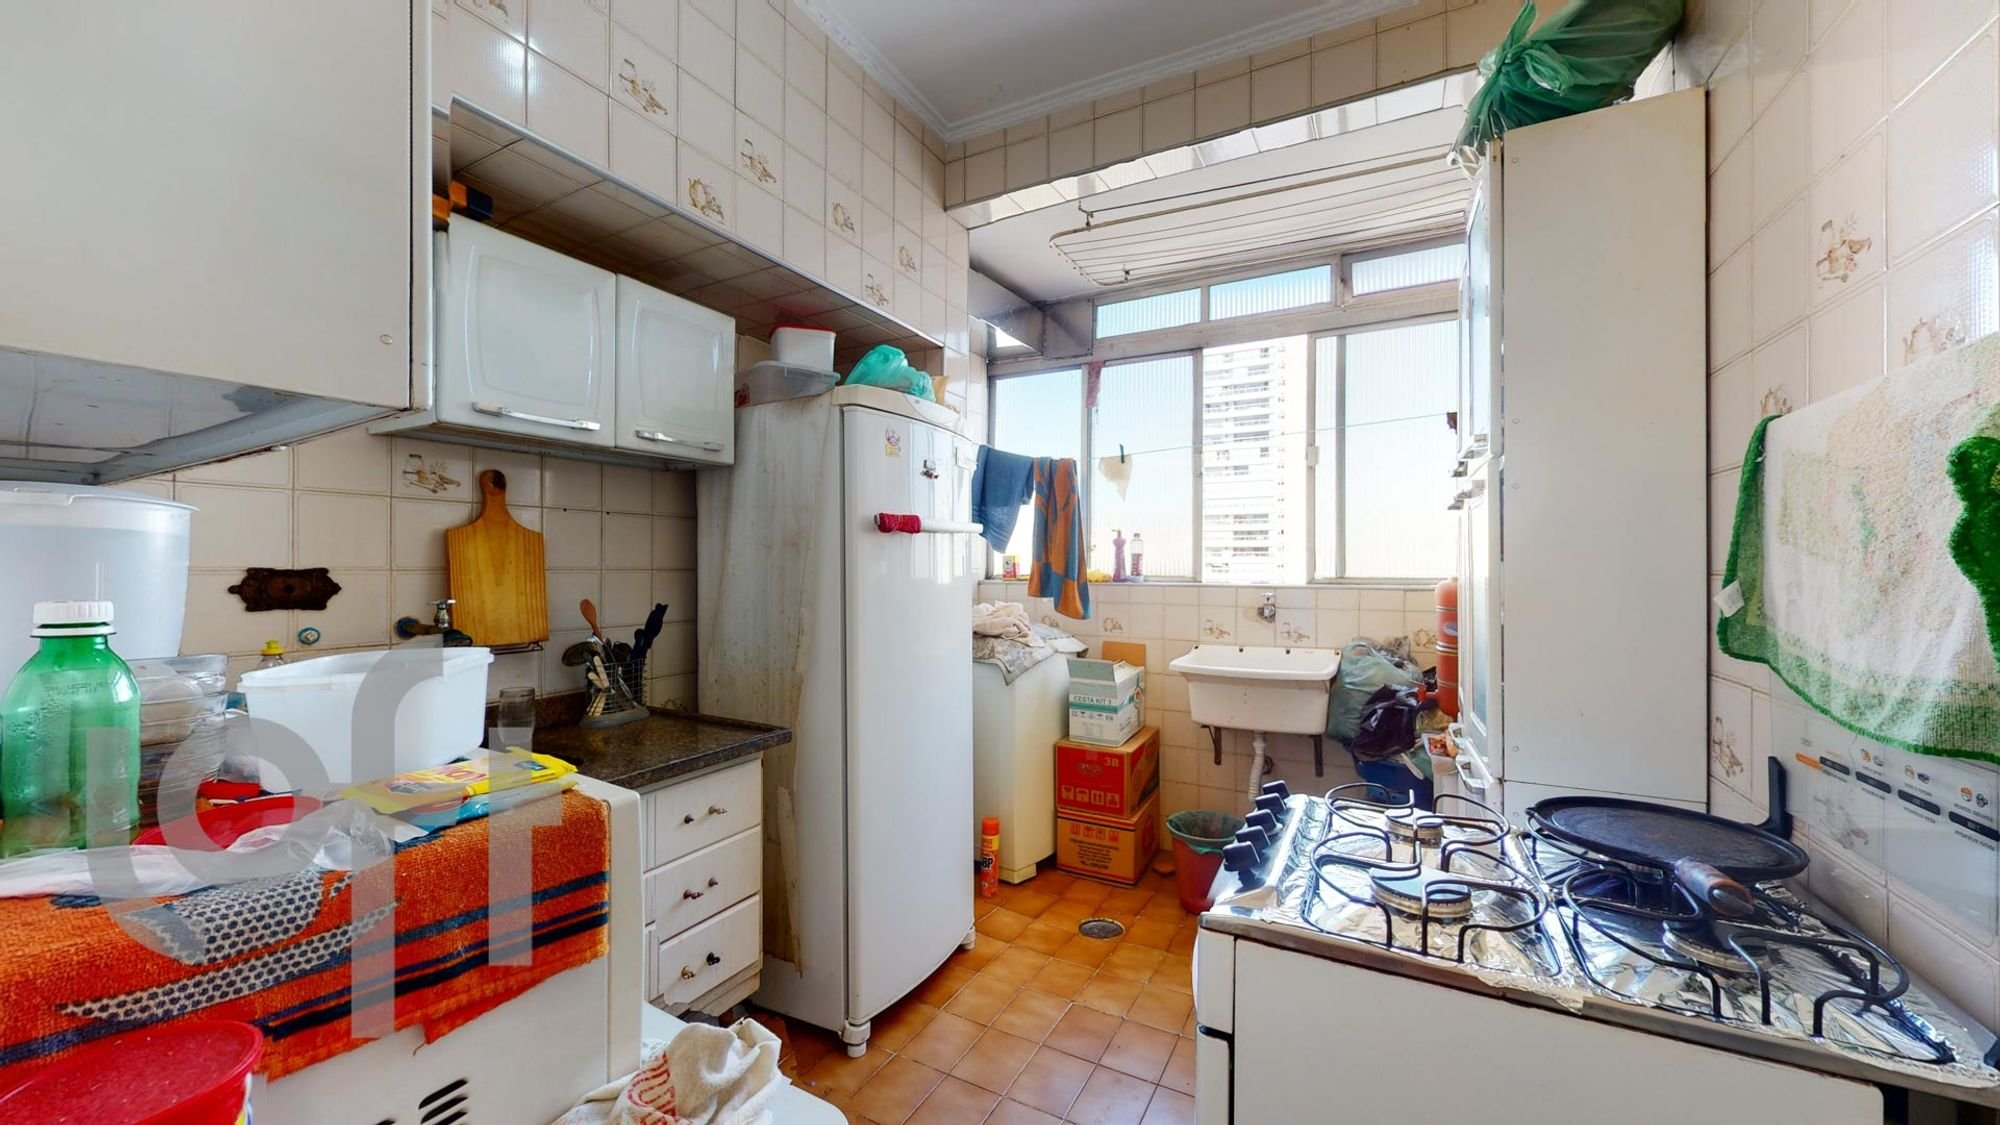 Foto de Lavanderia com geladeira, pia, garrafa